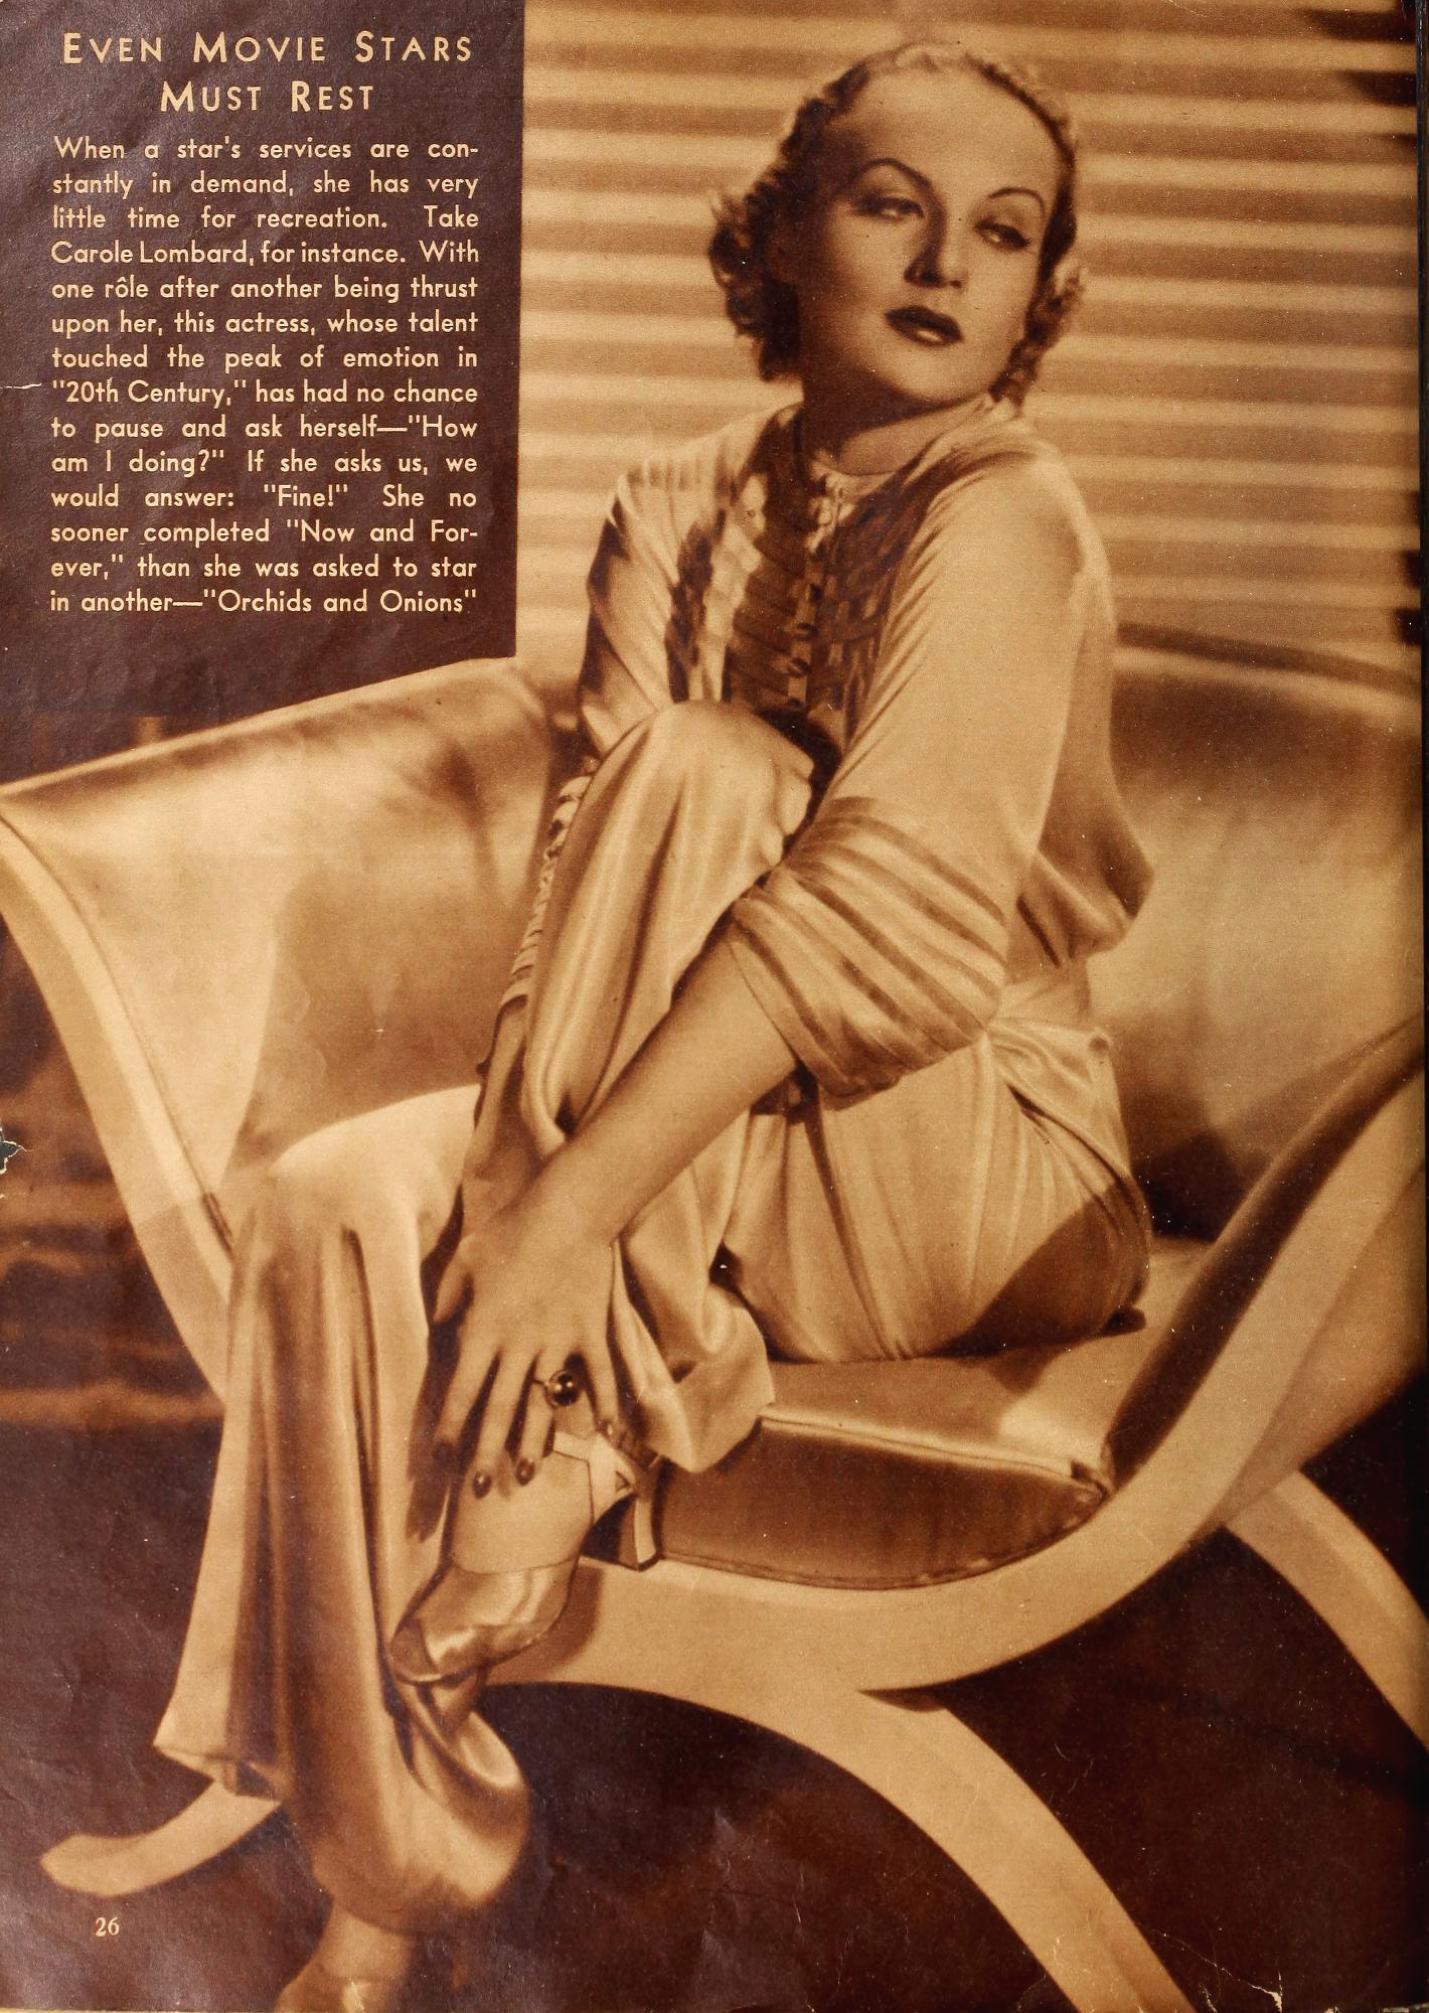 carole lombard movie classic october 1934aa